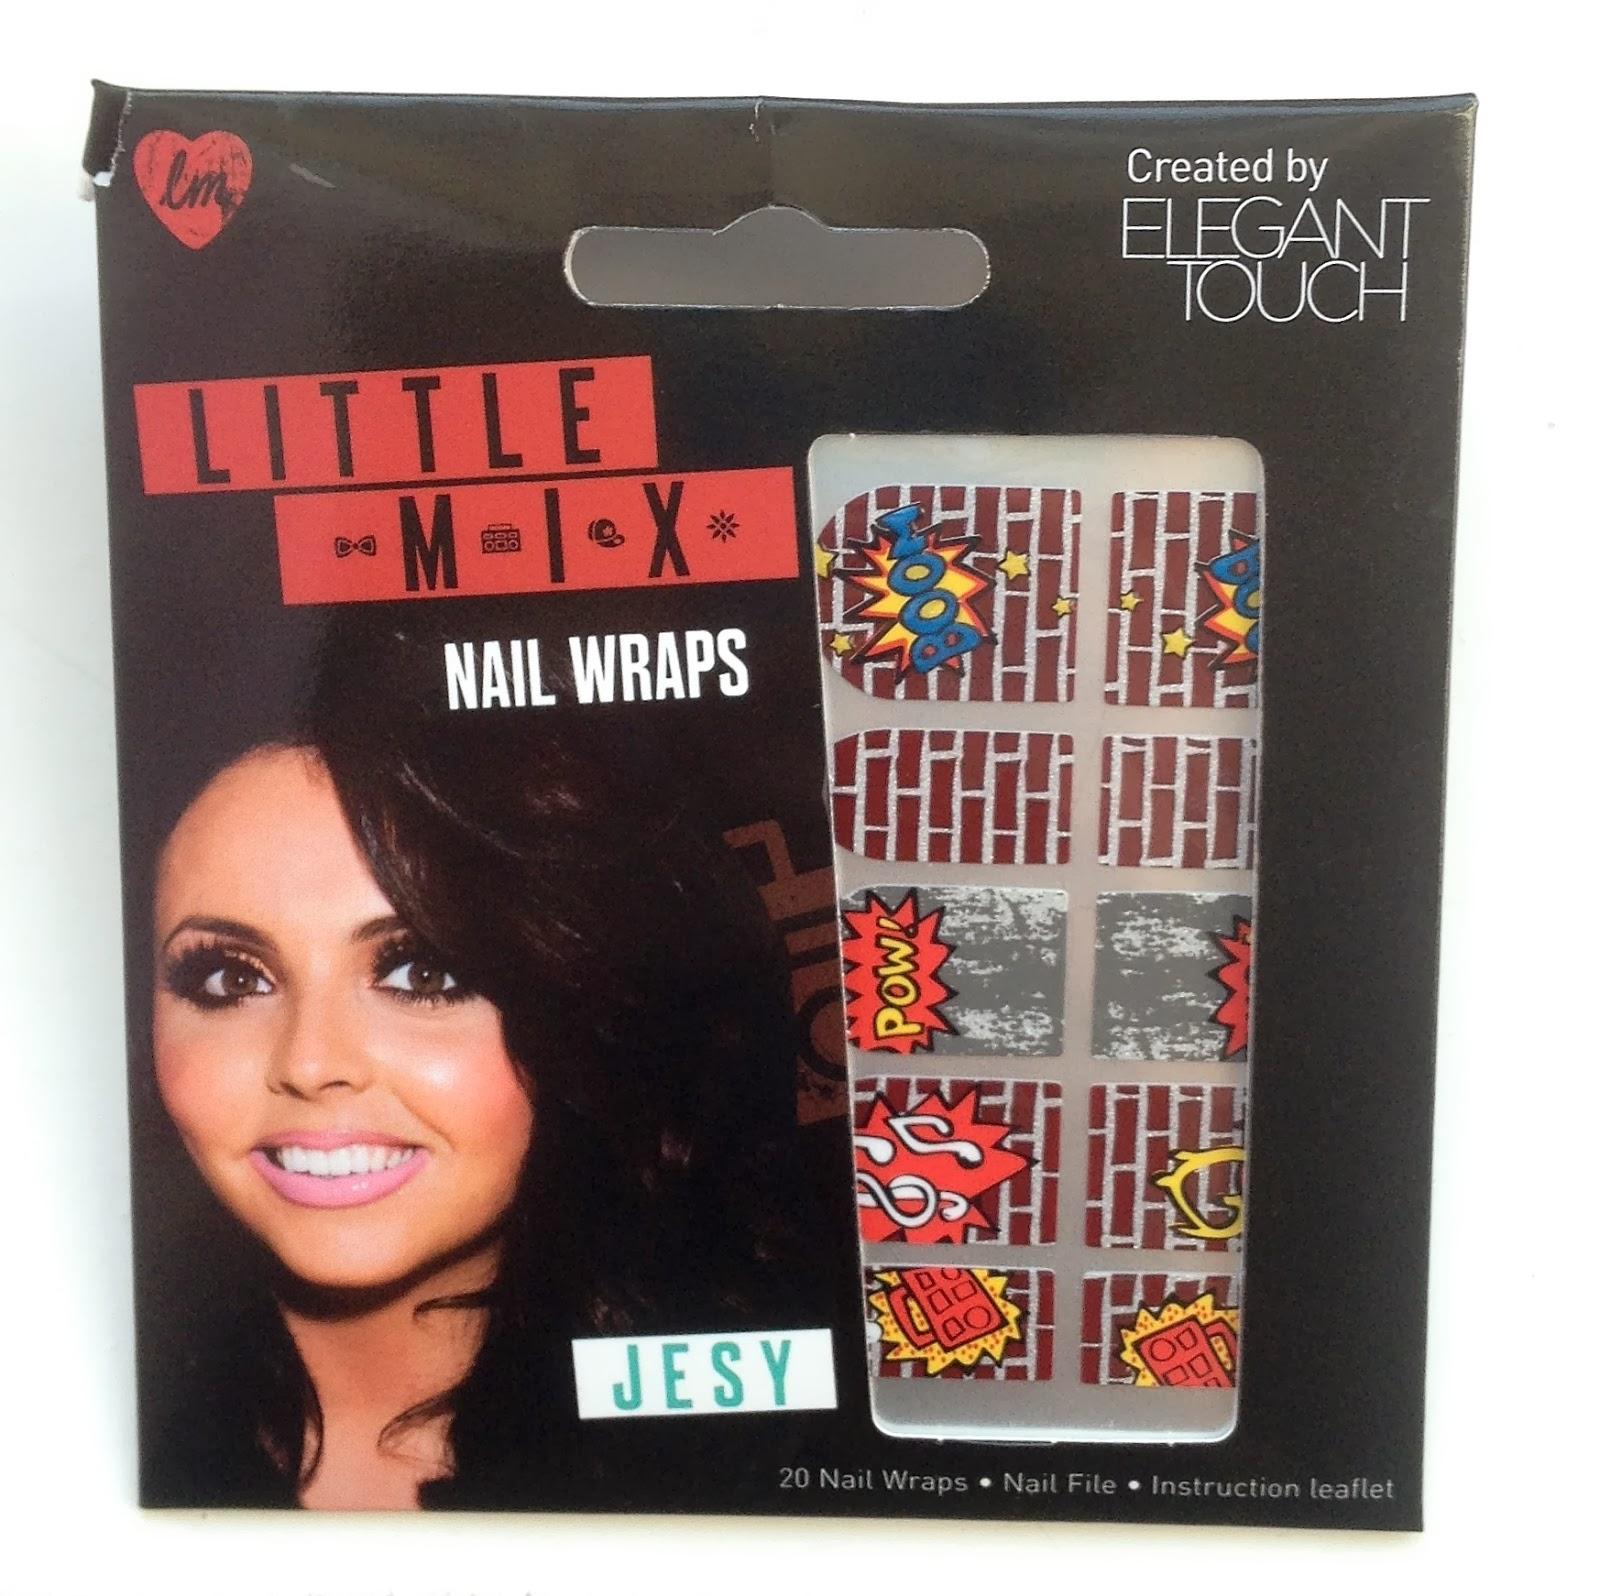 little-mix-jesy-nail-wraps